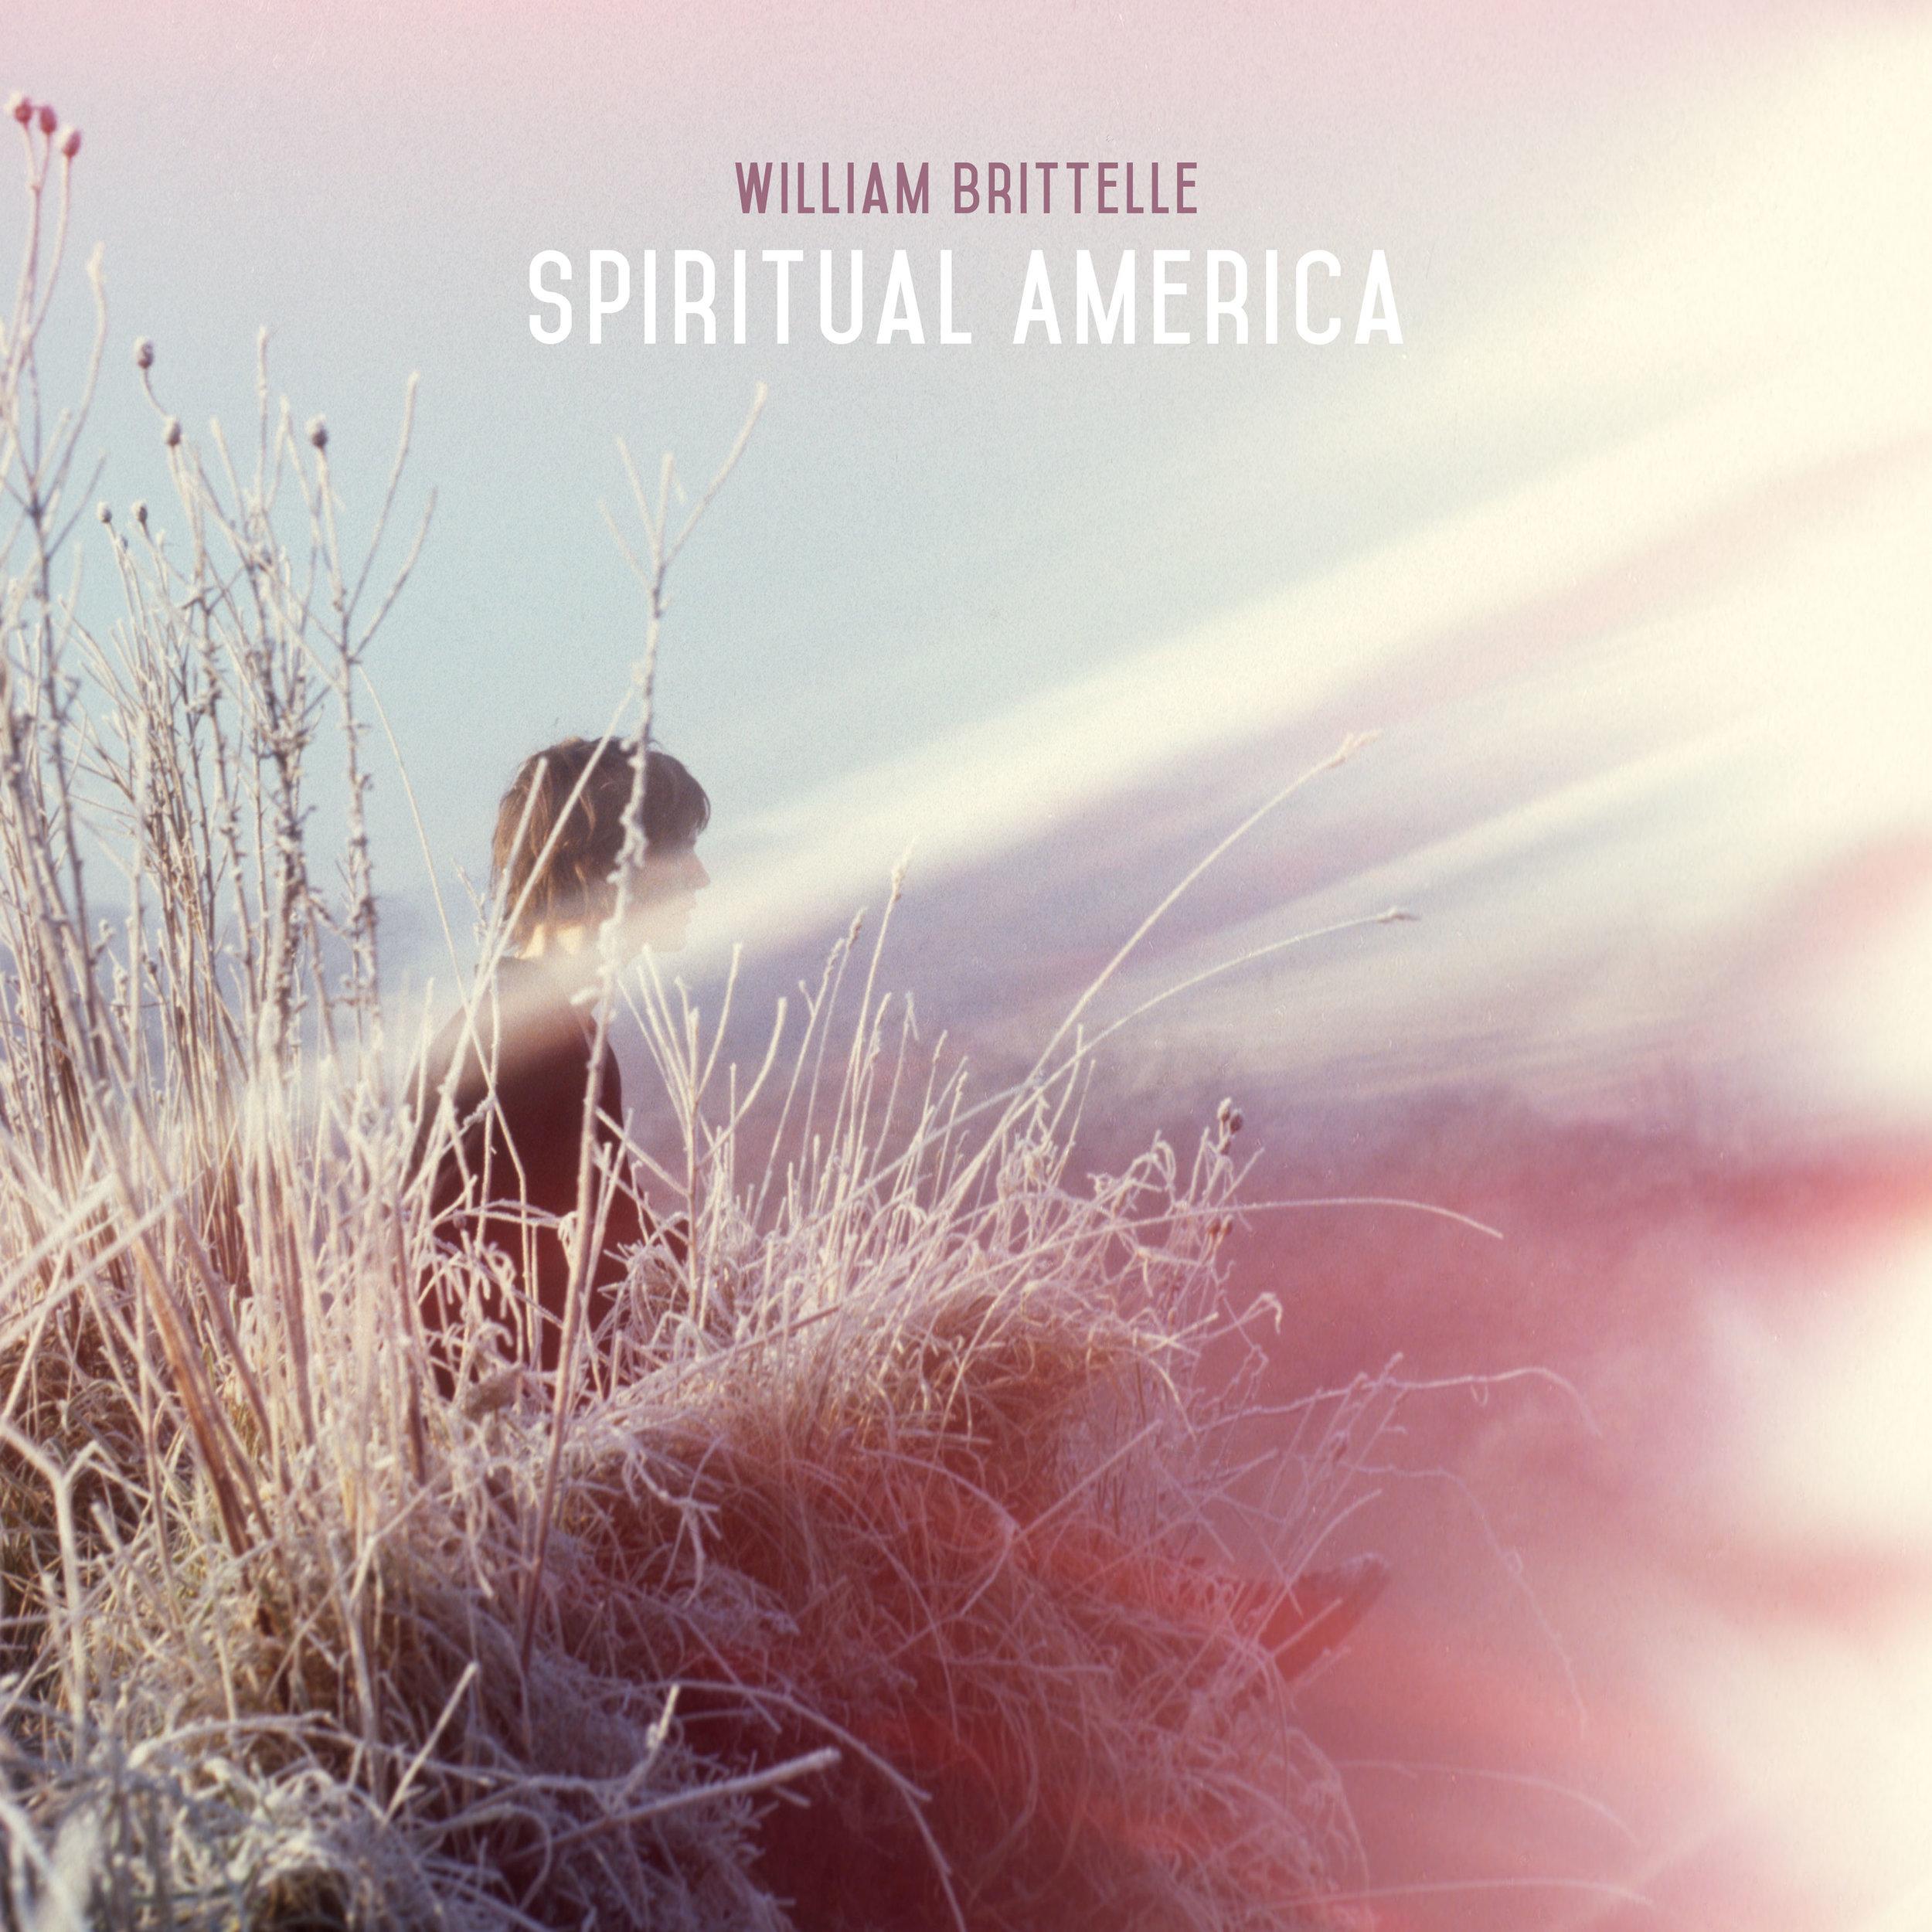 William Brittelle's Spiritual America with Wye Oak